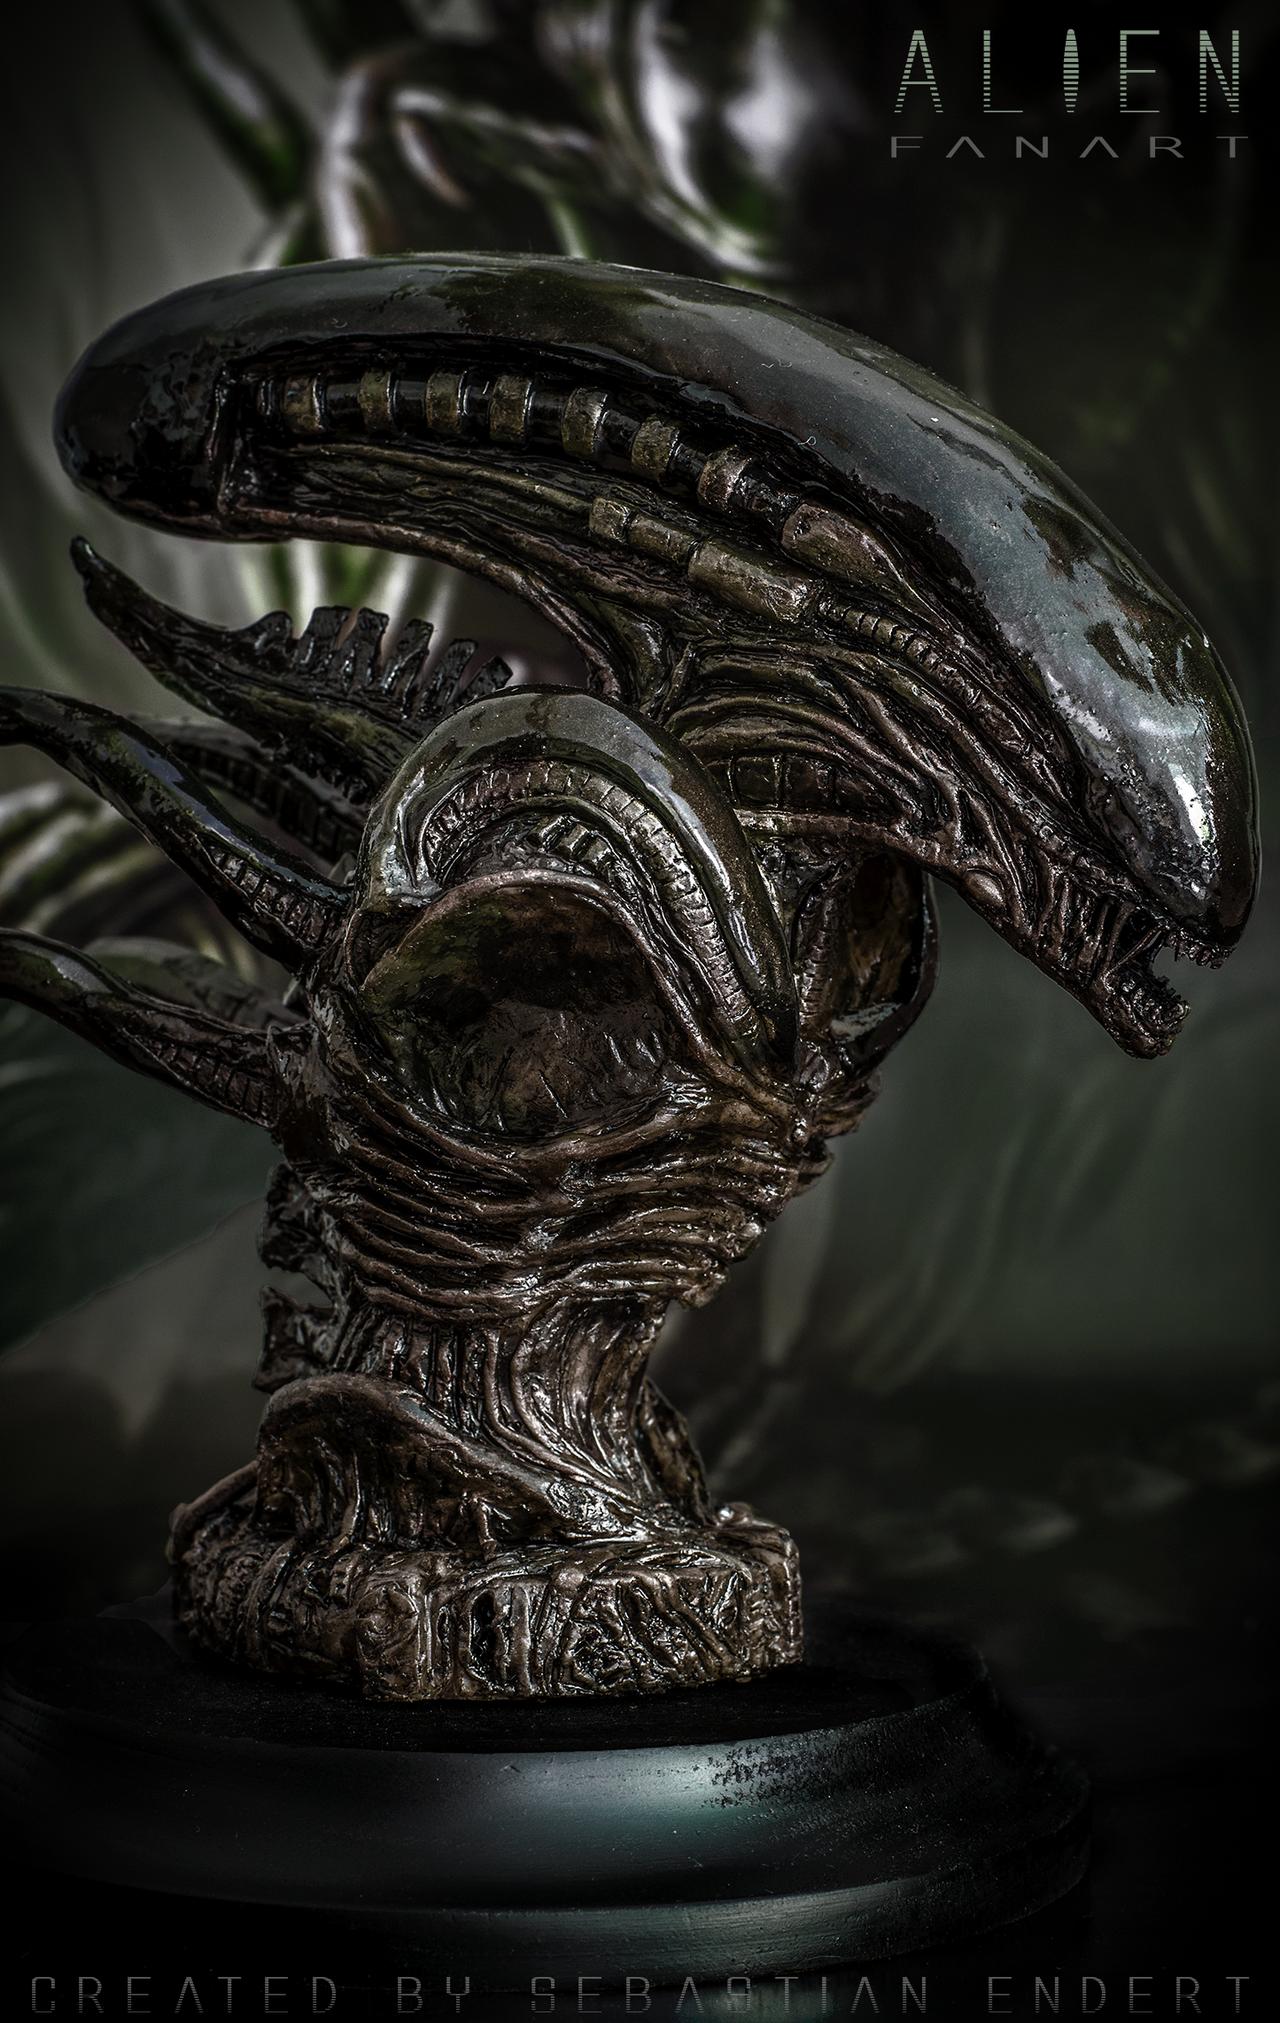 Alien sculpture photo